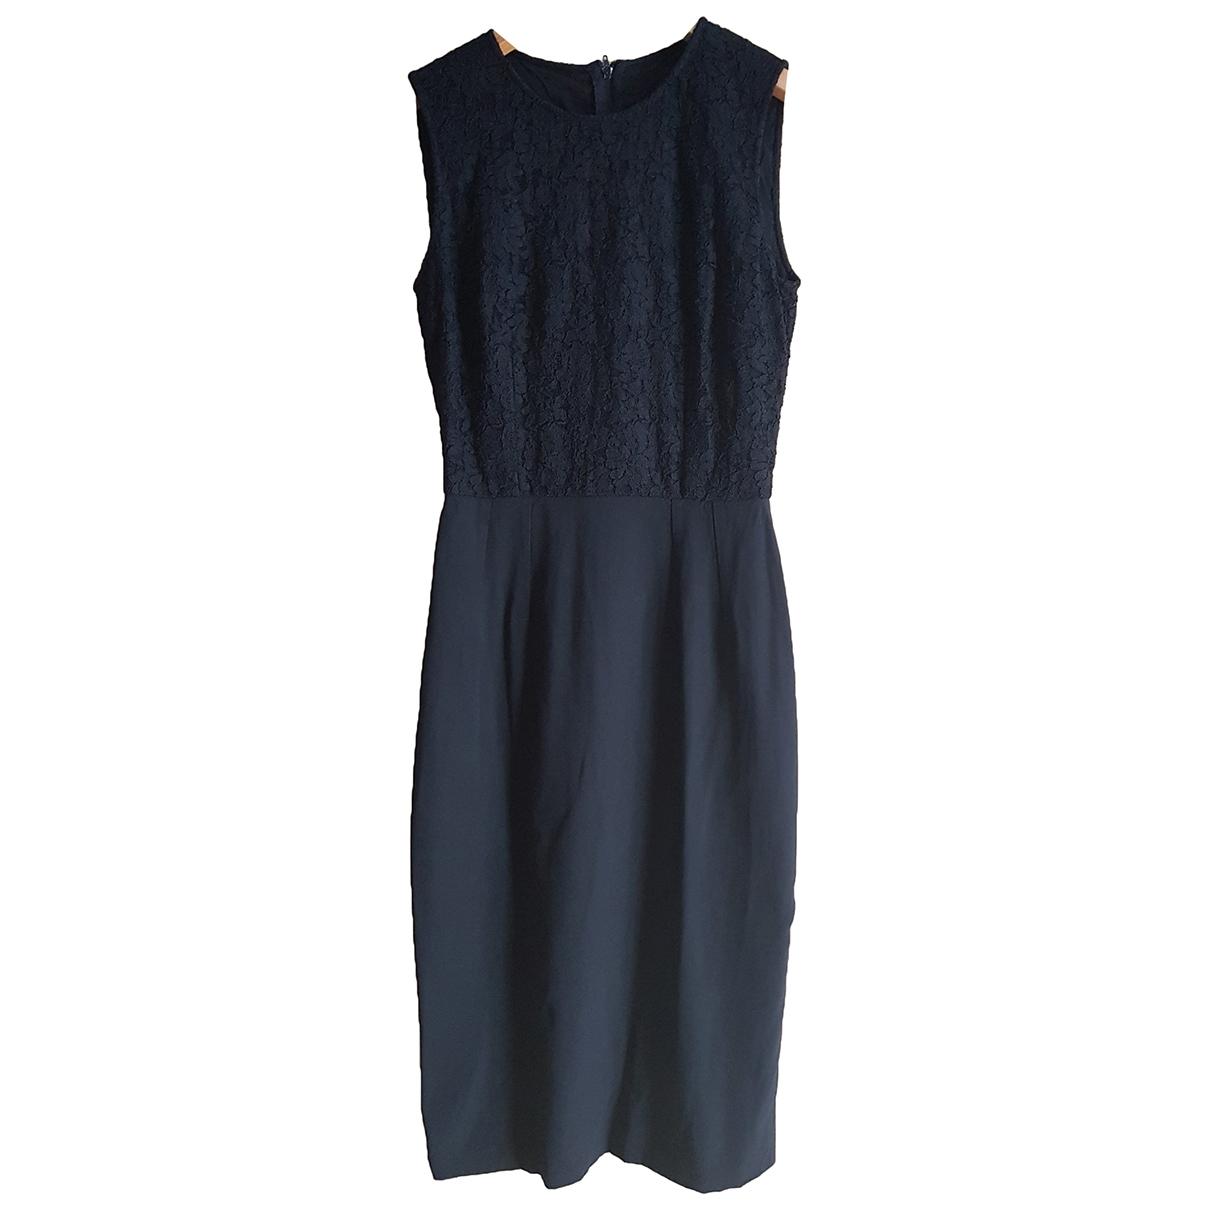 Dolce & Gabbana \N Black Cotton dress for Women 40 IT